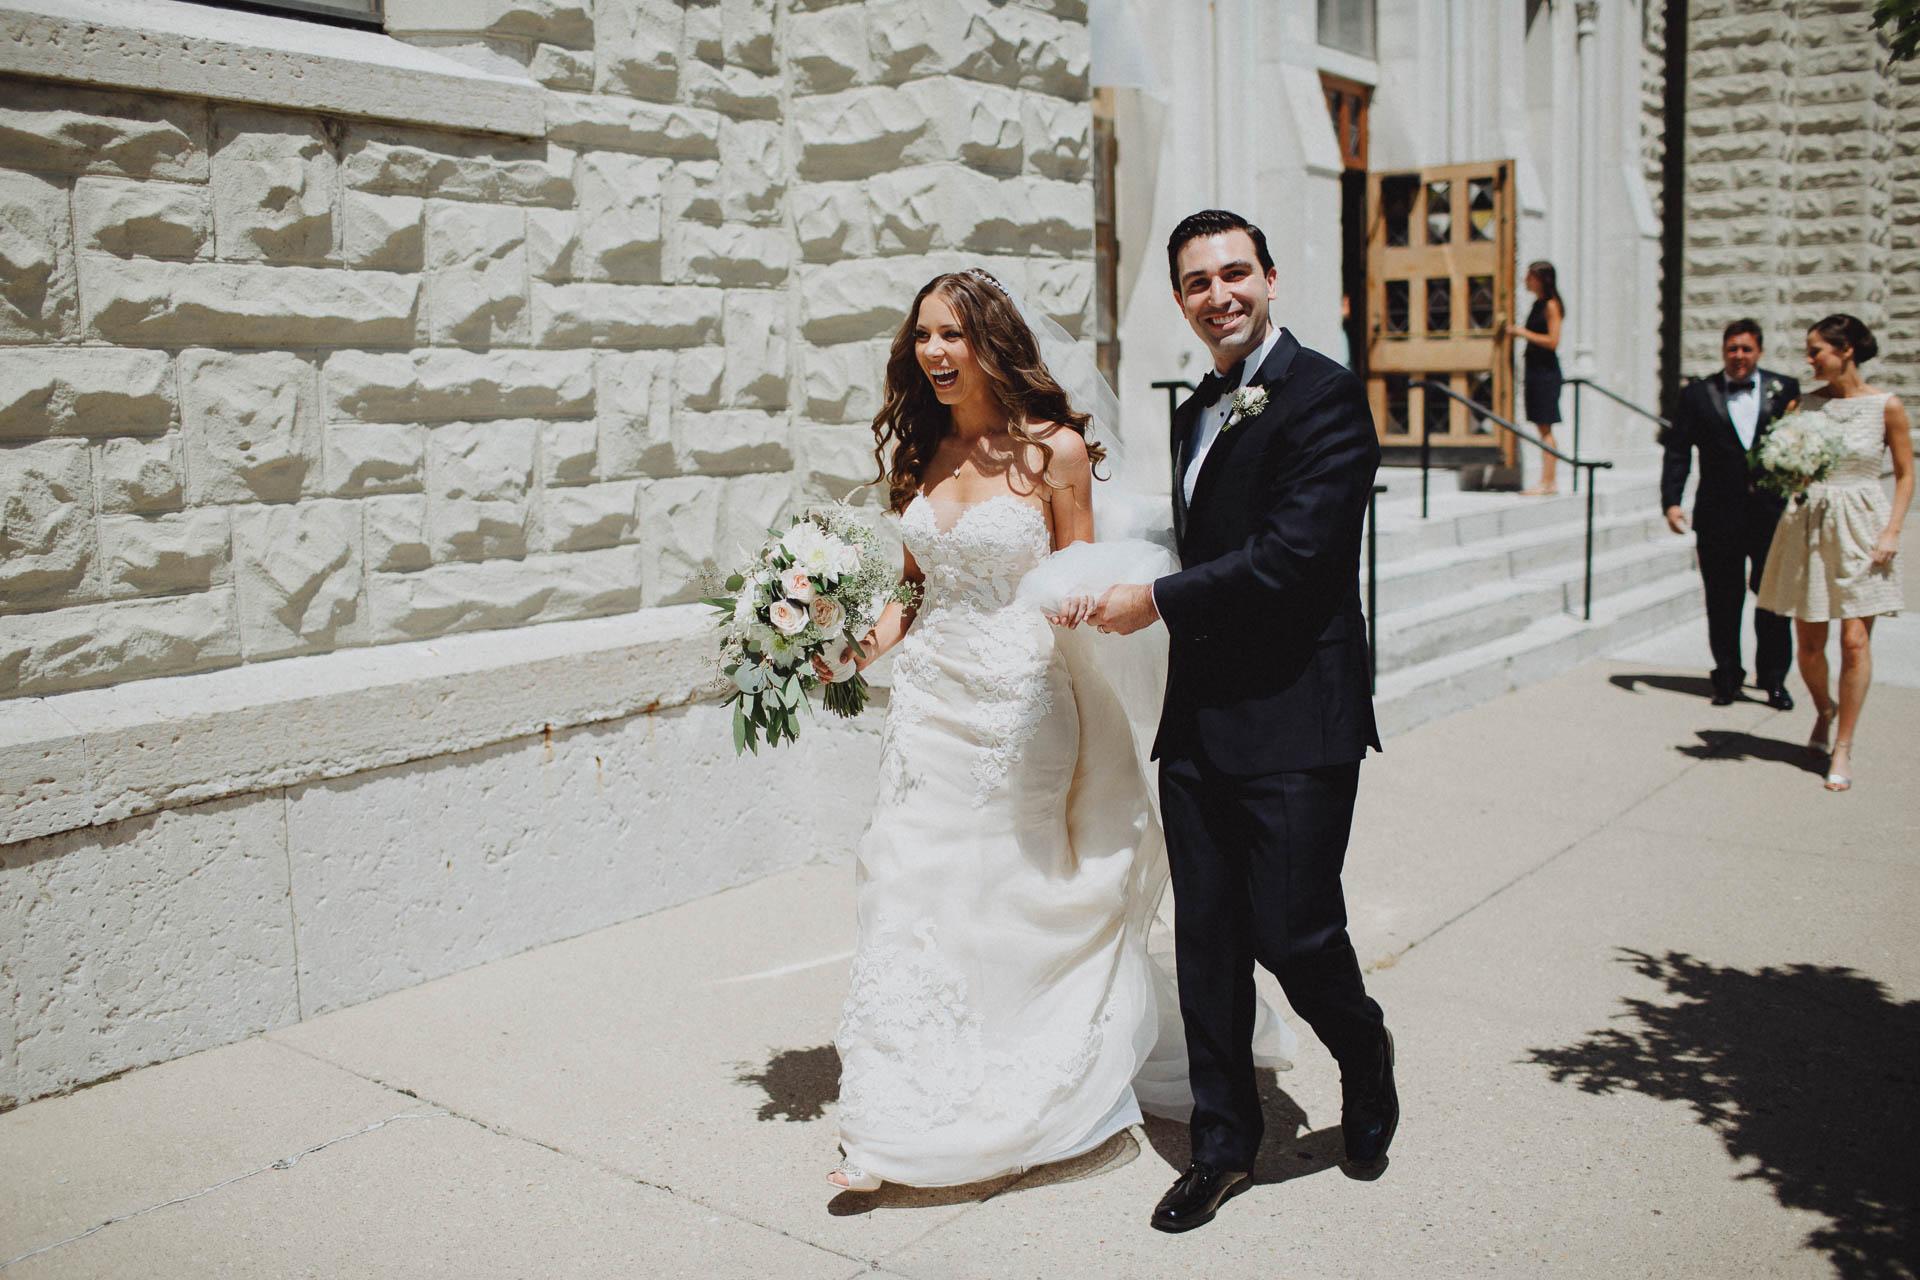 Keri-Joseph-Top-of-the-Market-Wedding-086@2x.jpg